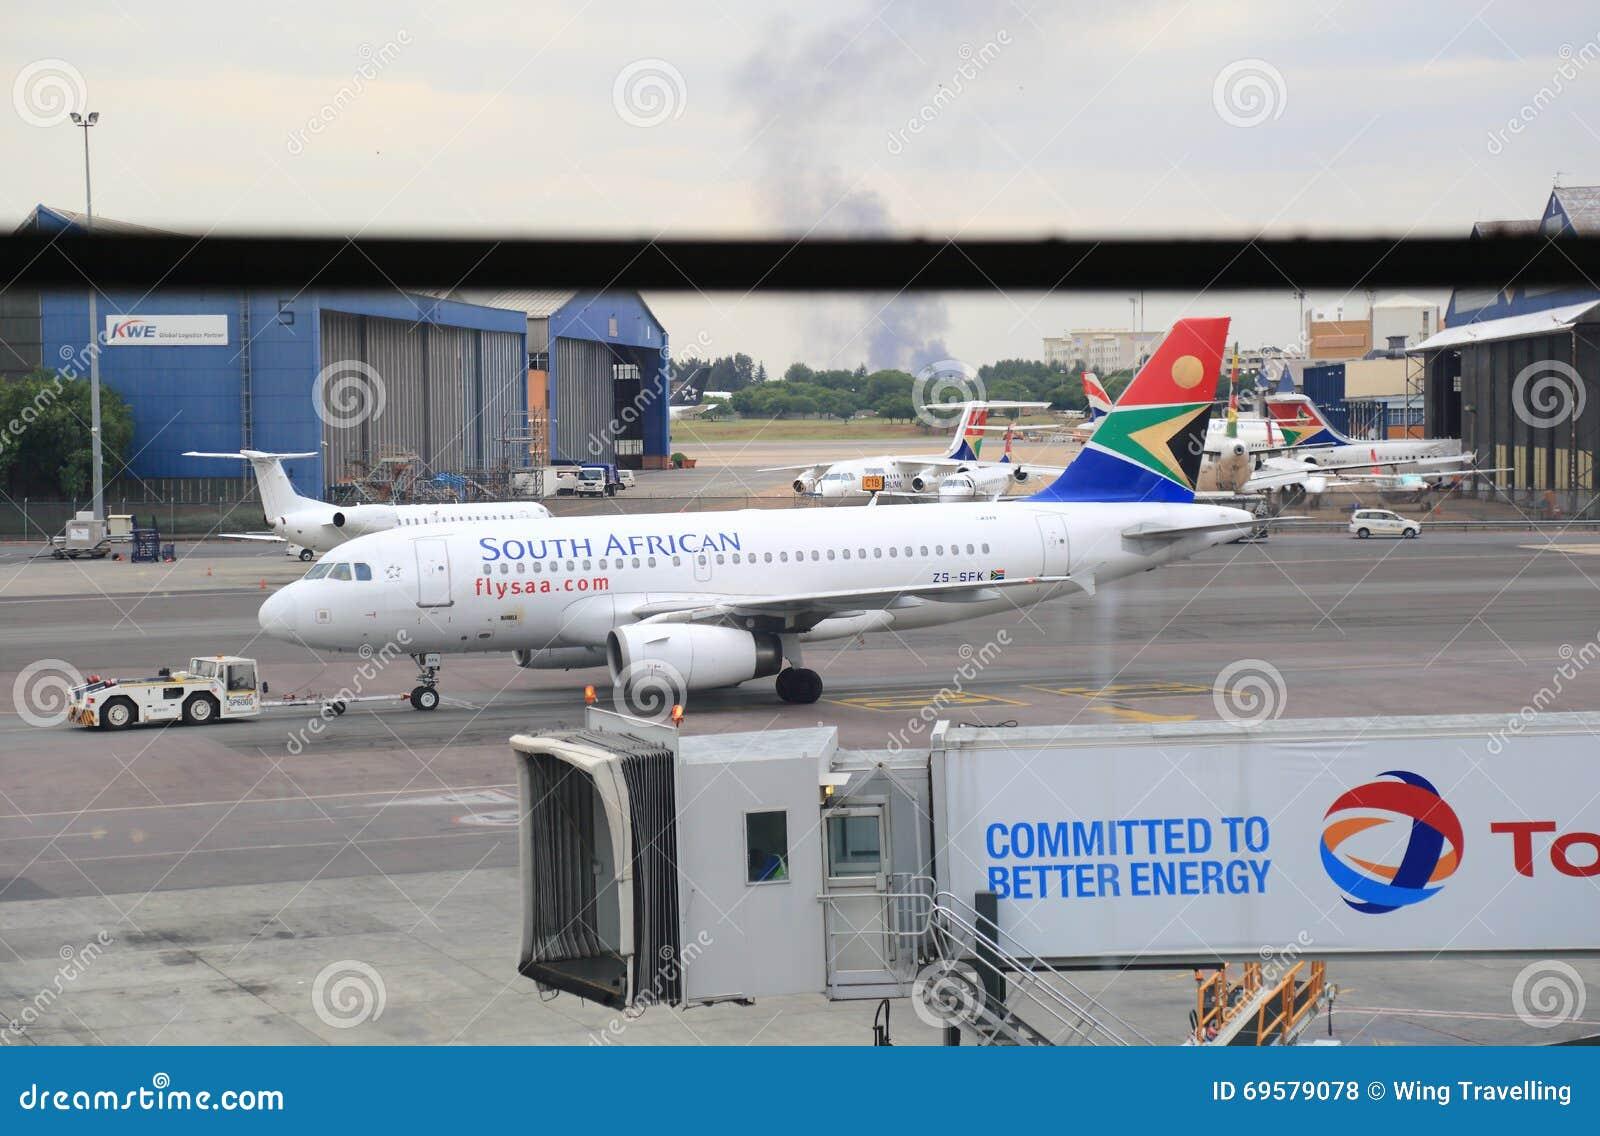 Aeroporto Johannesburg : Johannesburg tambo airport editorial image cartoondealer